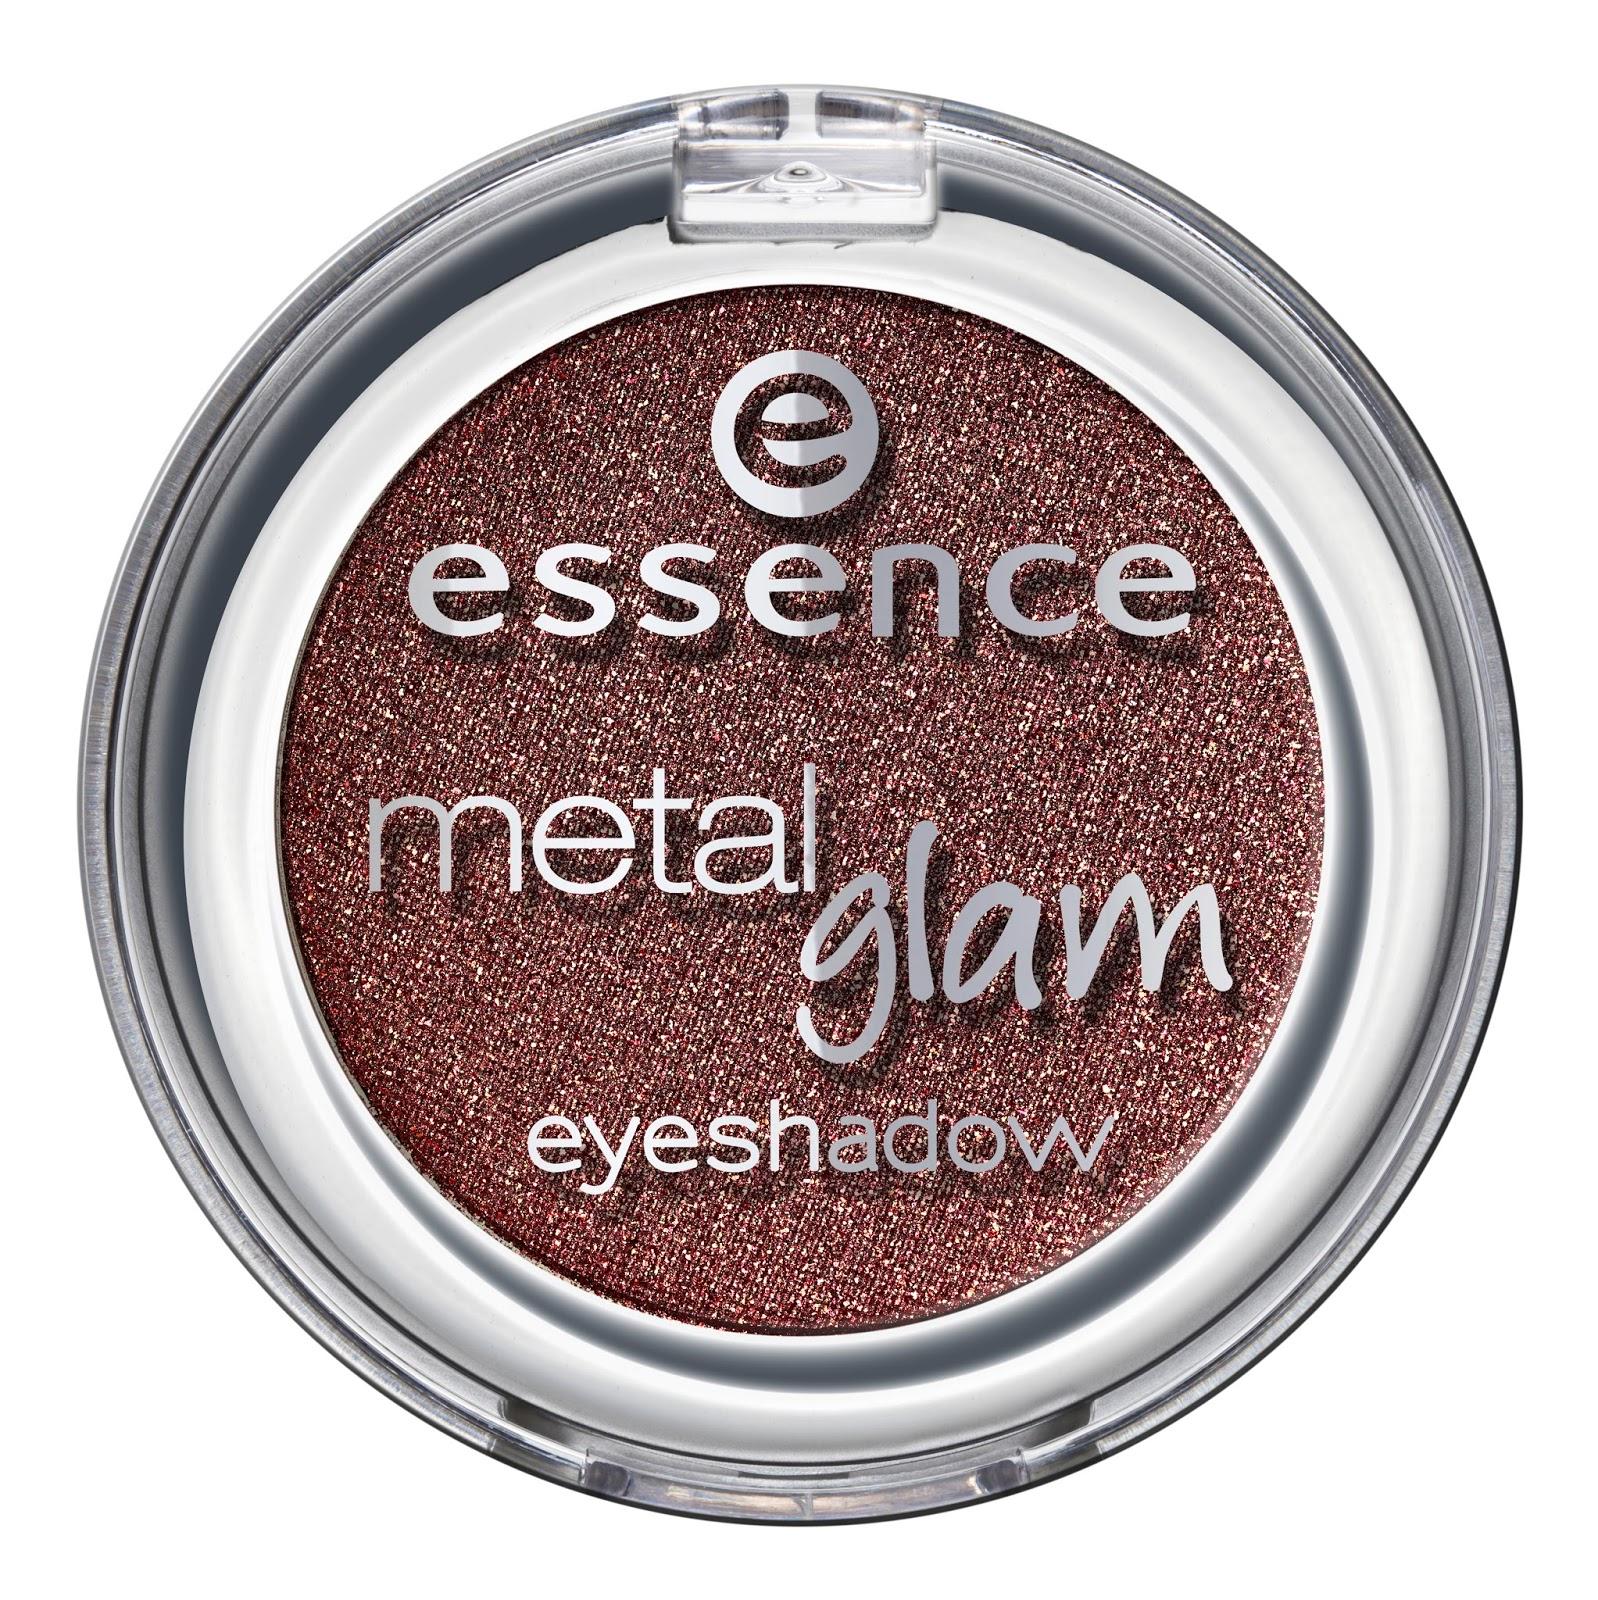 Essence metal glam eyeshadow